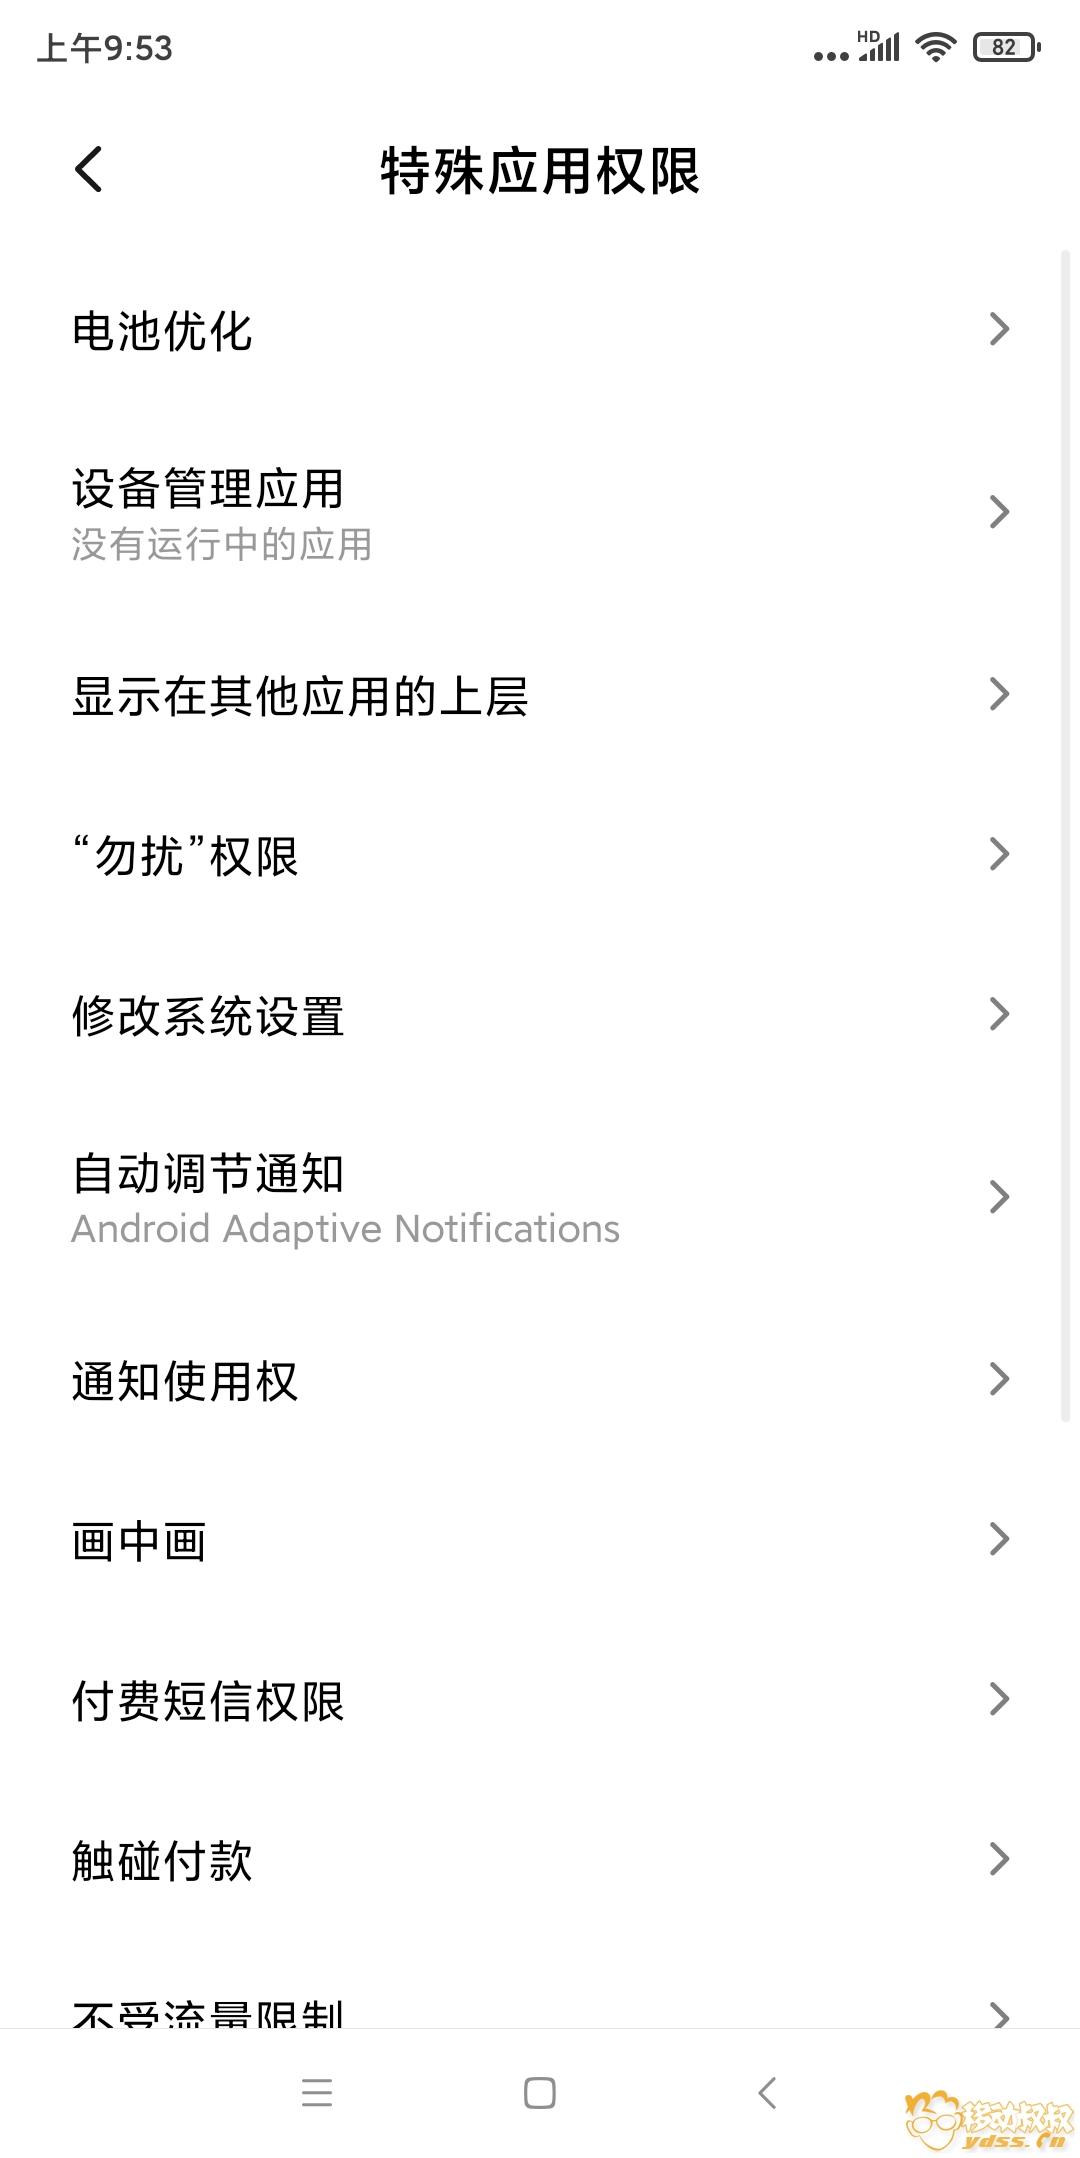 Screenshot_2019-11-06-09-53-17-118_com.android.settings.jpg